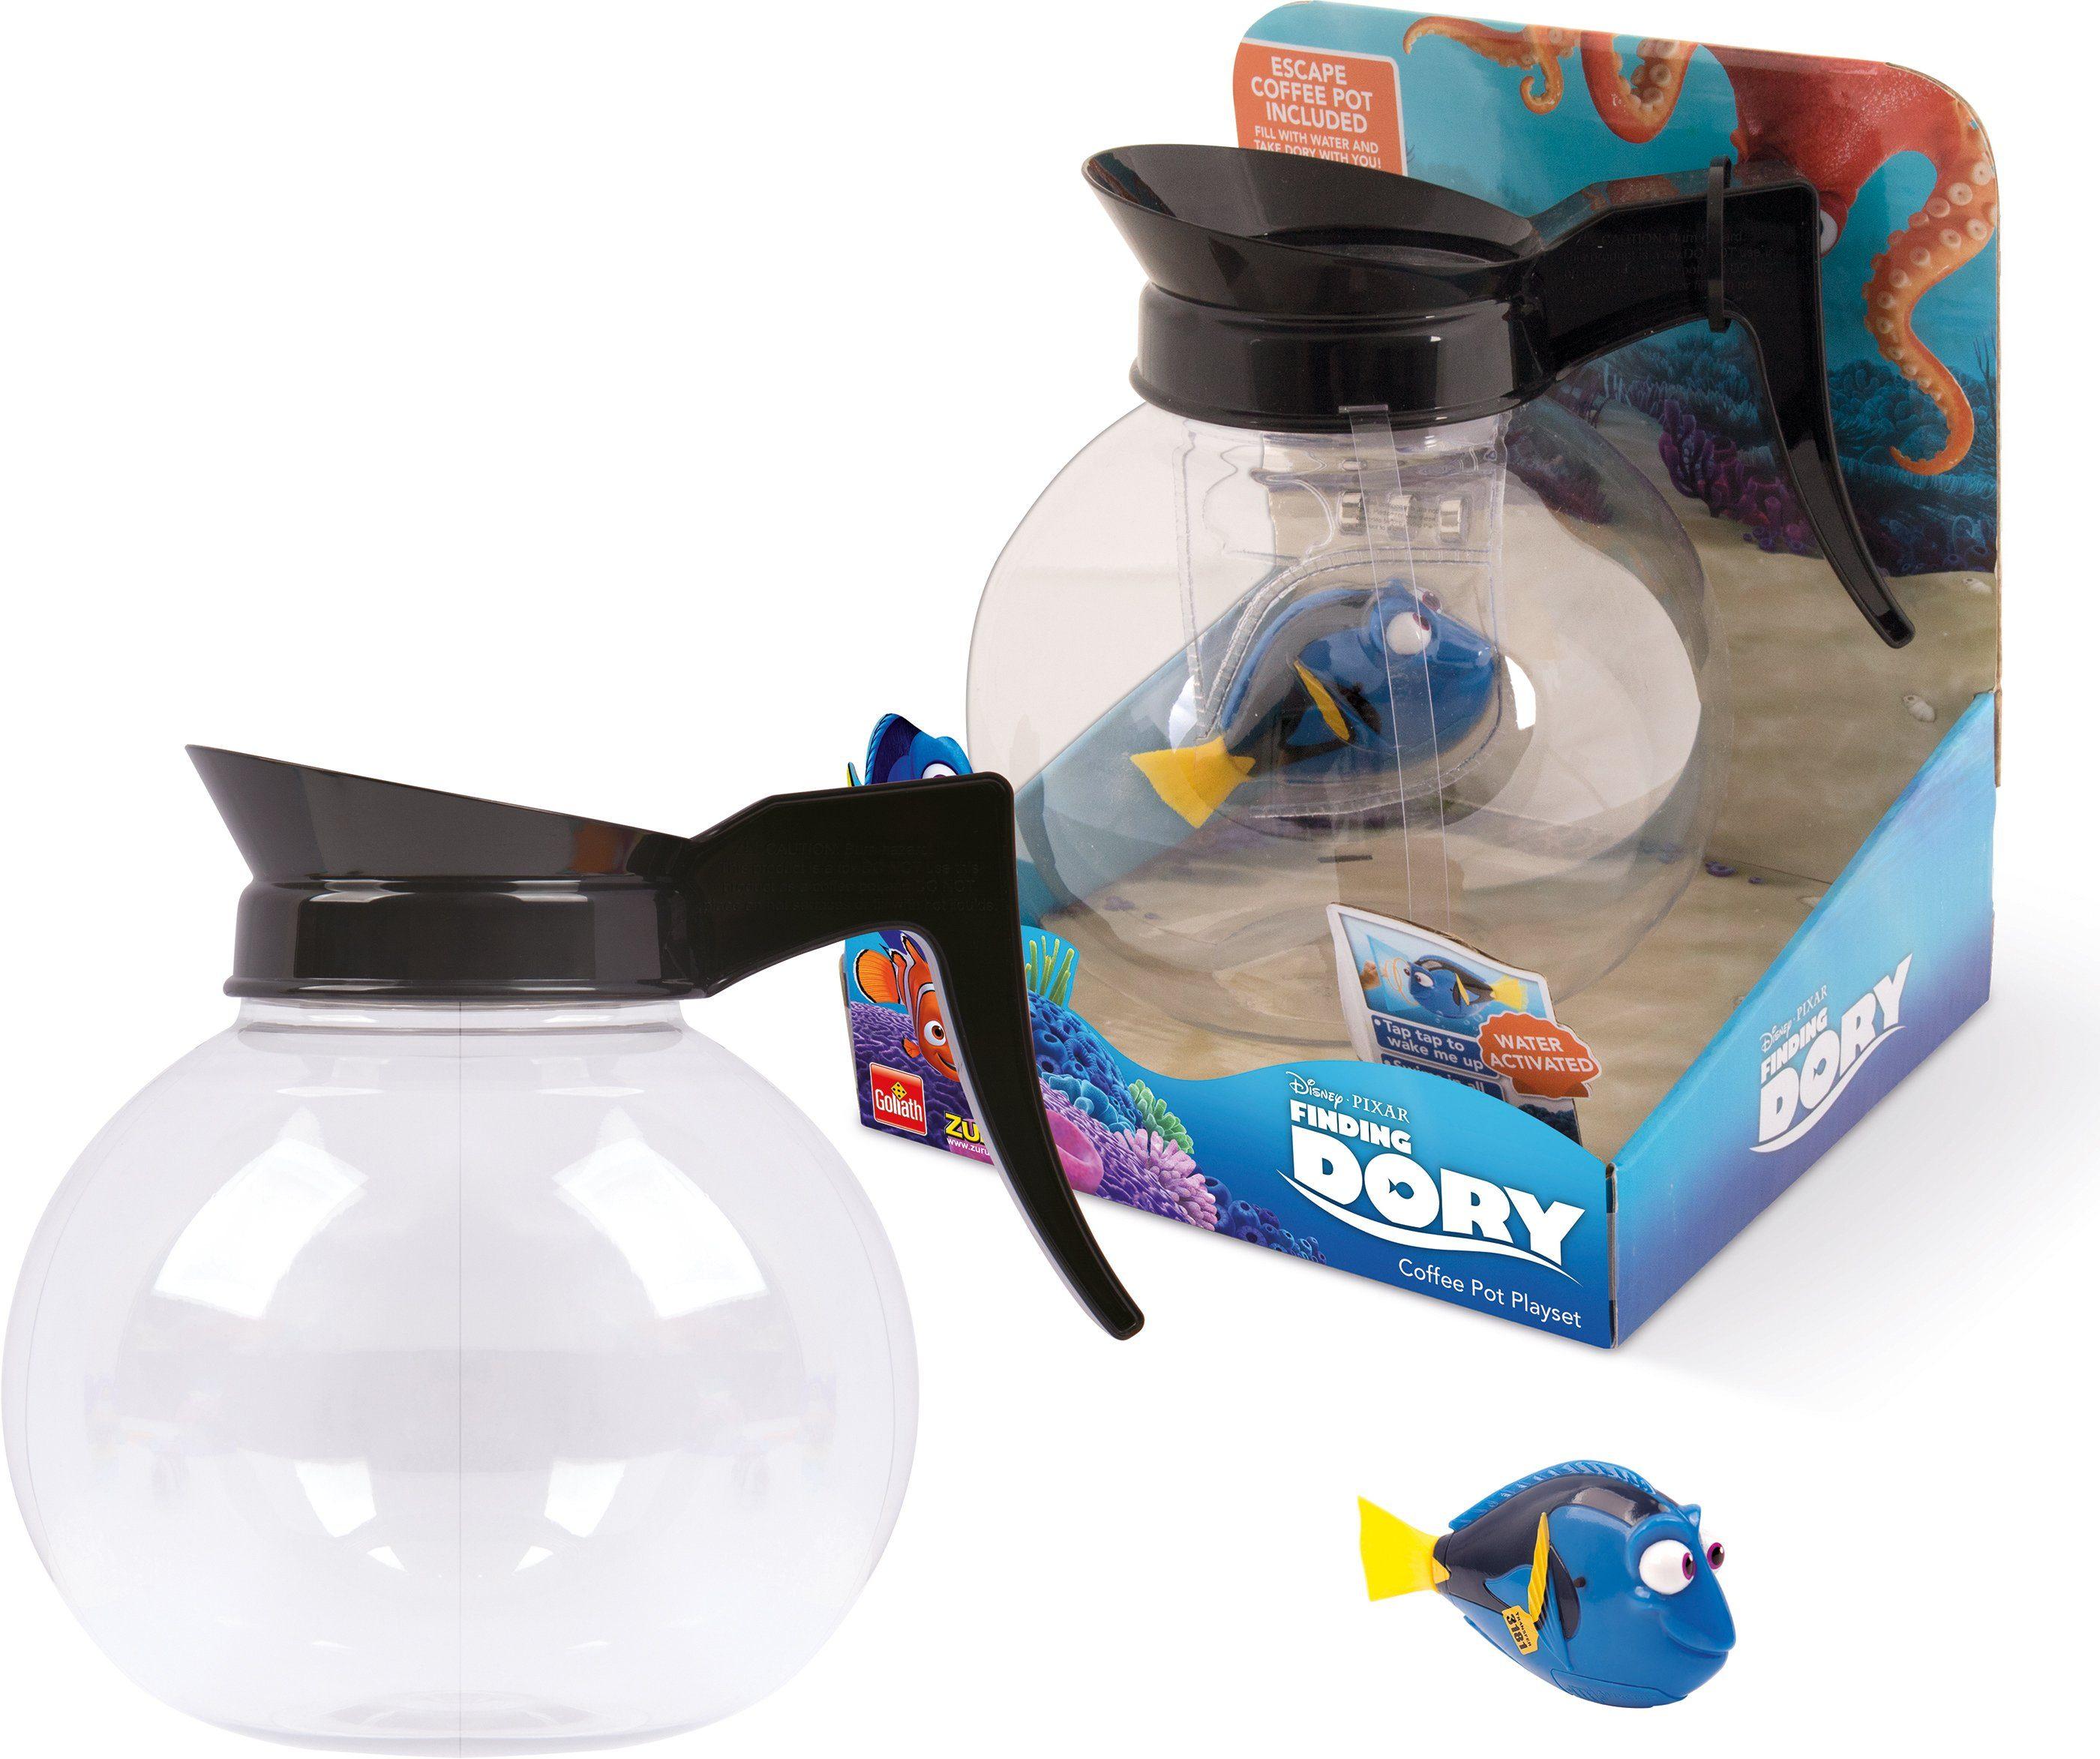 Goliath Wasserspielzeug, »Disney Pixar Finding Dory - Coffee Pot Playset«